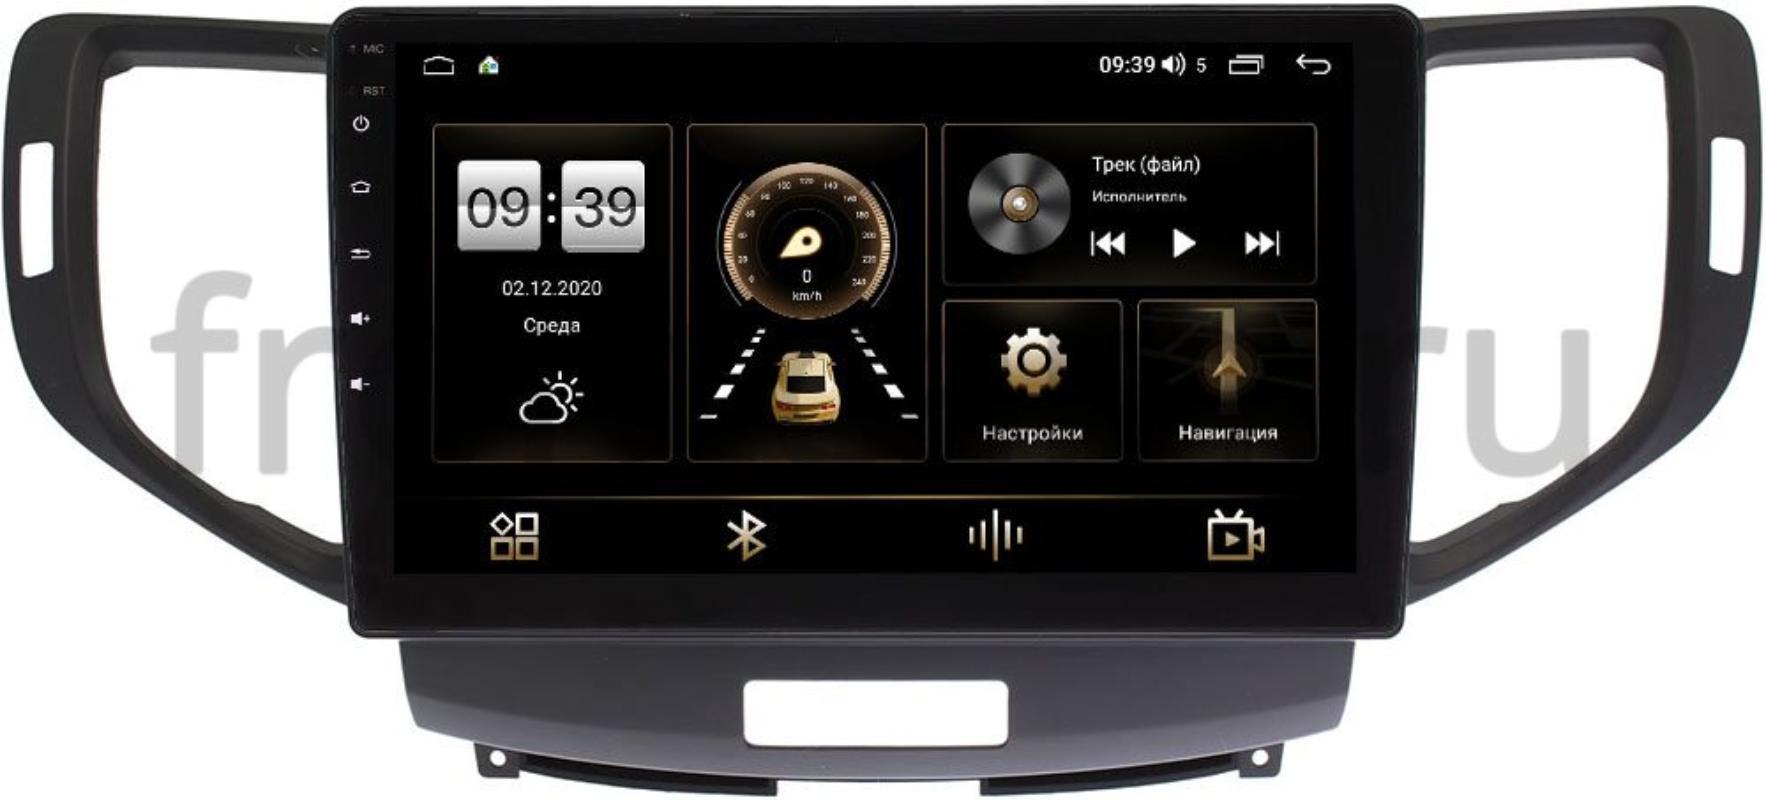 Штатная магнитола LeTrun 4166-9-accord для Honda Accord 8 (VIII) RUS 2008-2013 на Android 10 (4G-SIM, 3/32, DSP, QLed) (+ Камера заднего вида в подарок!)